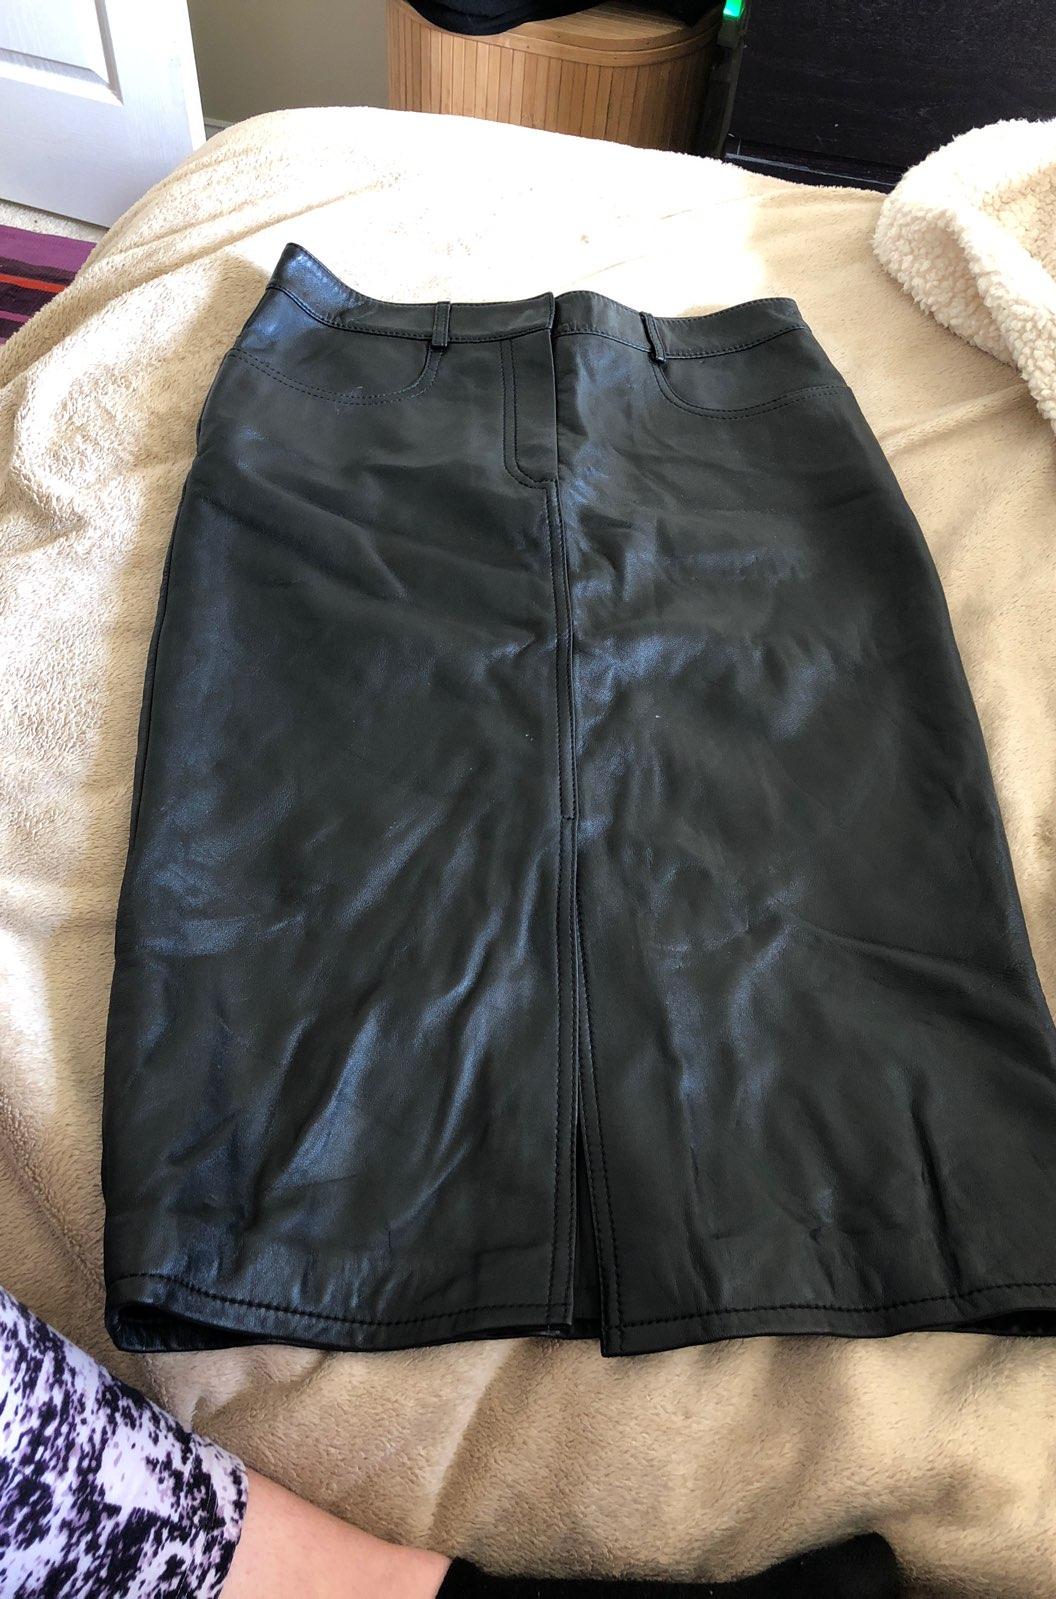 DKNY Black Leather Knee Length Skirt